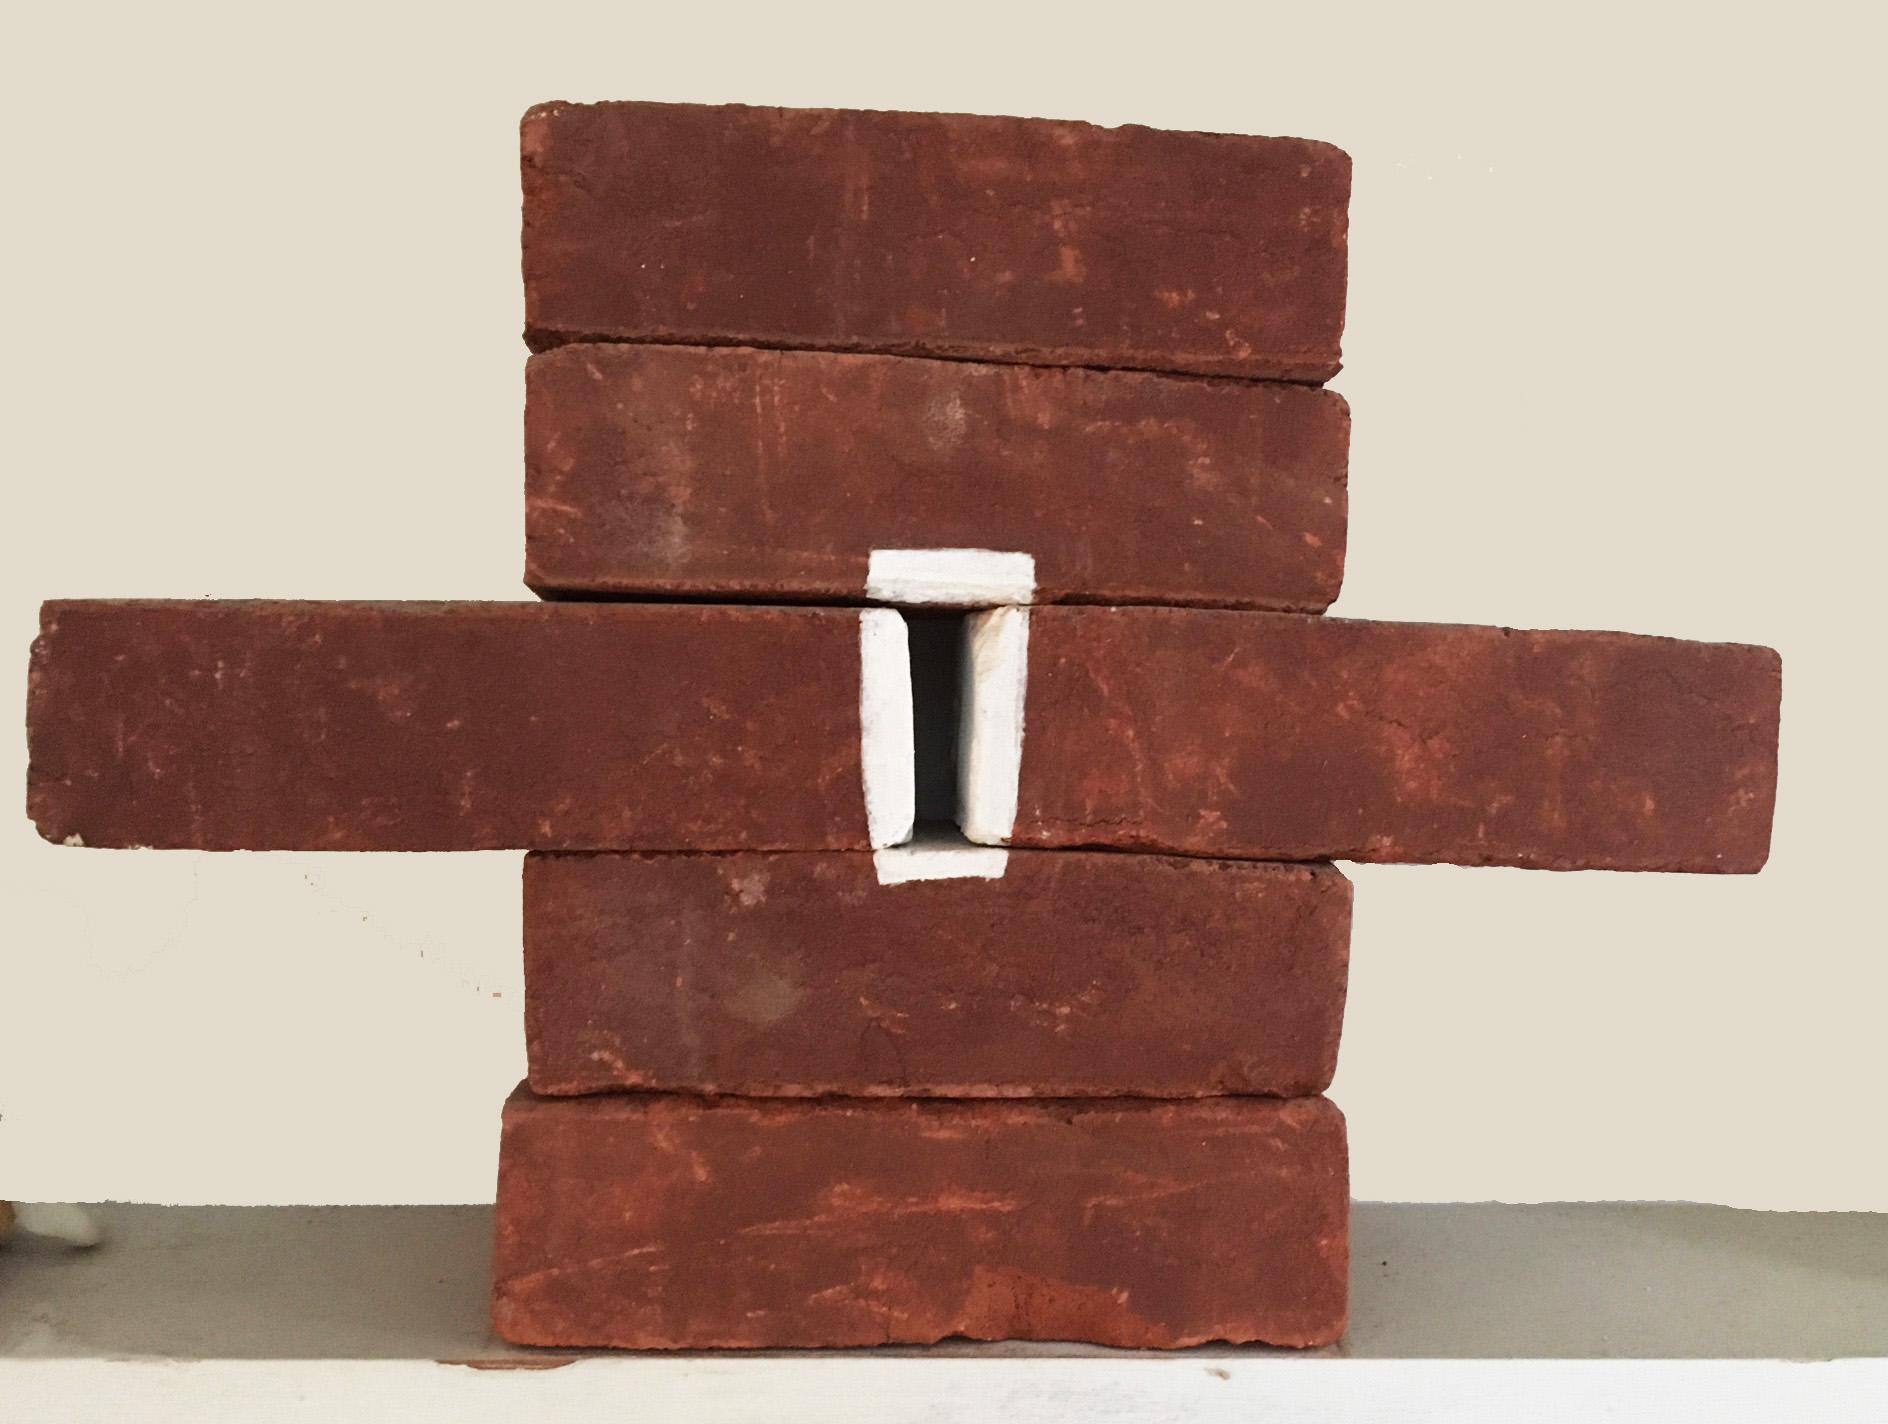 Brick-a-Brac 3    12  x 16 x 4 inches    Acrylic on Bricks 2000